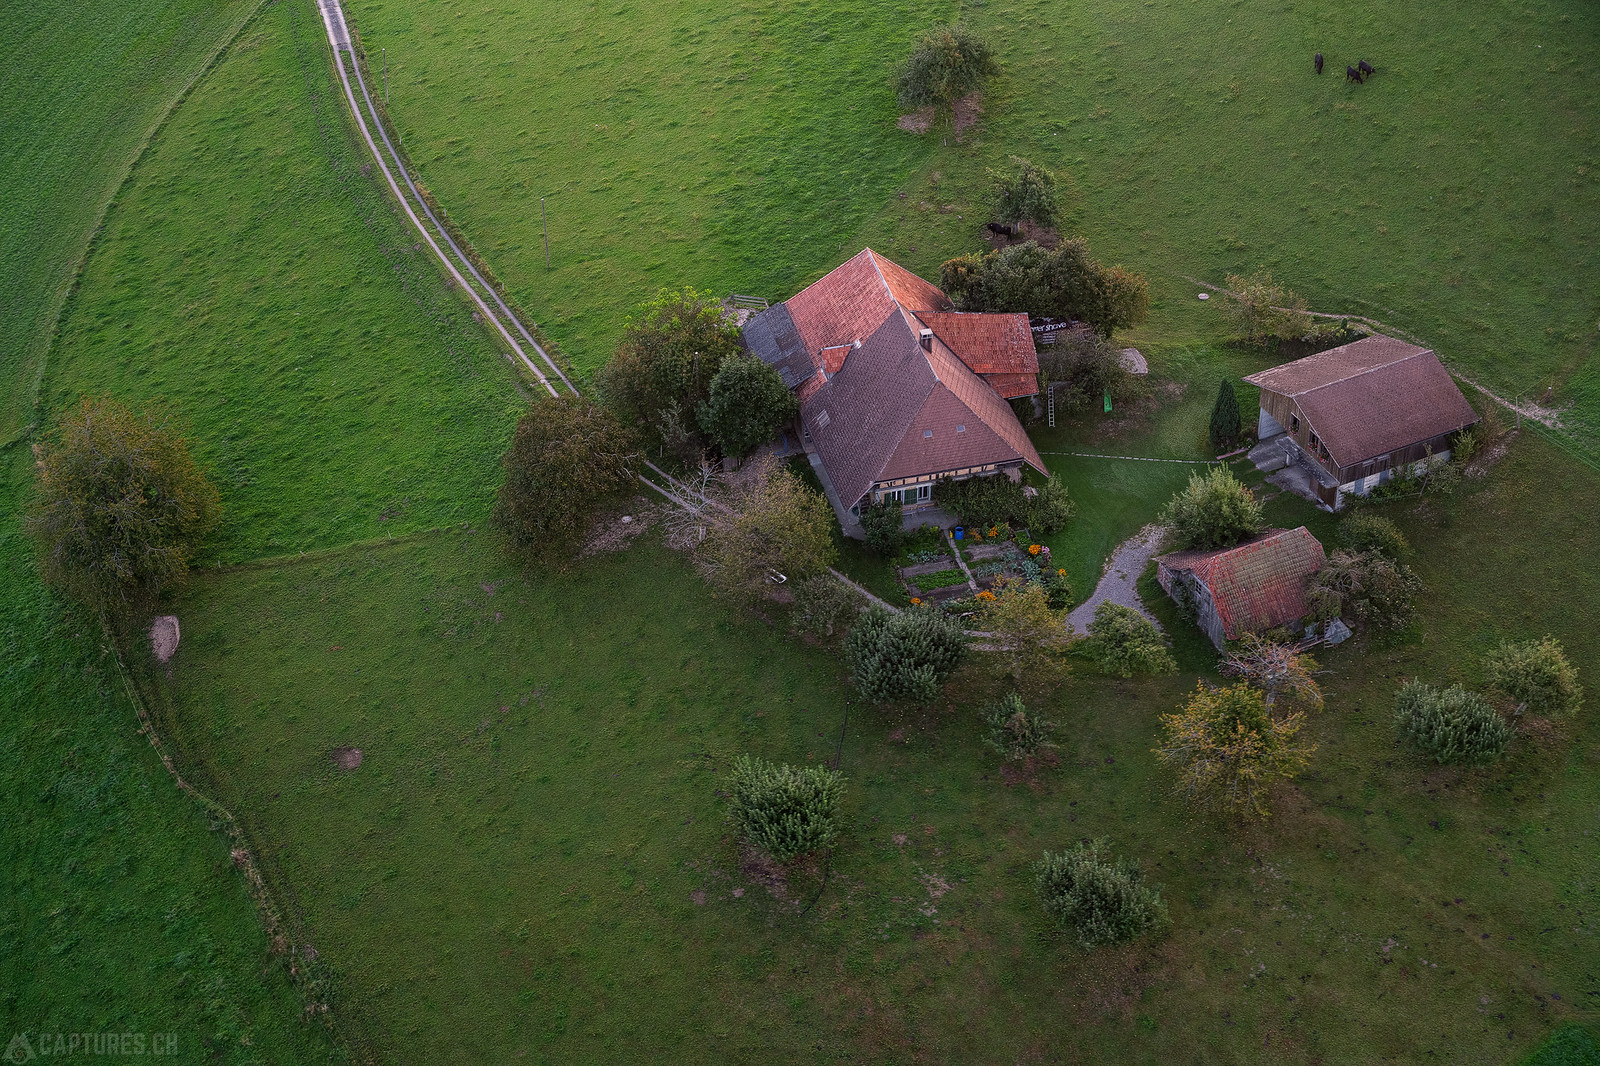 Farm - Sumiswald